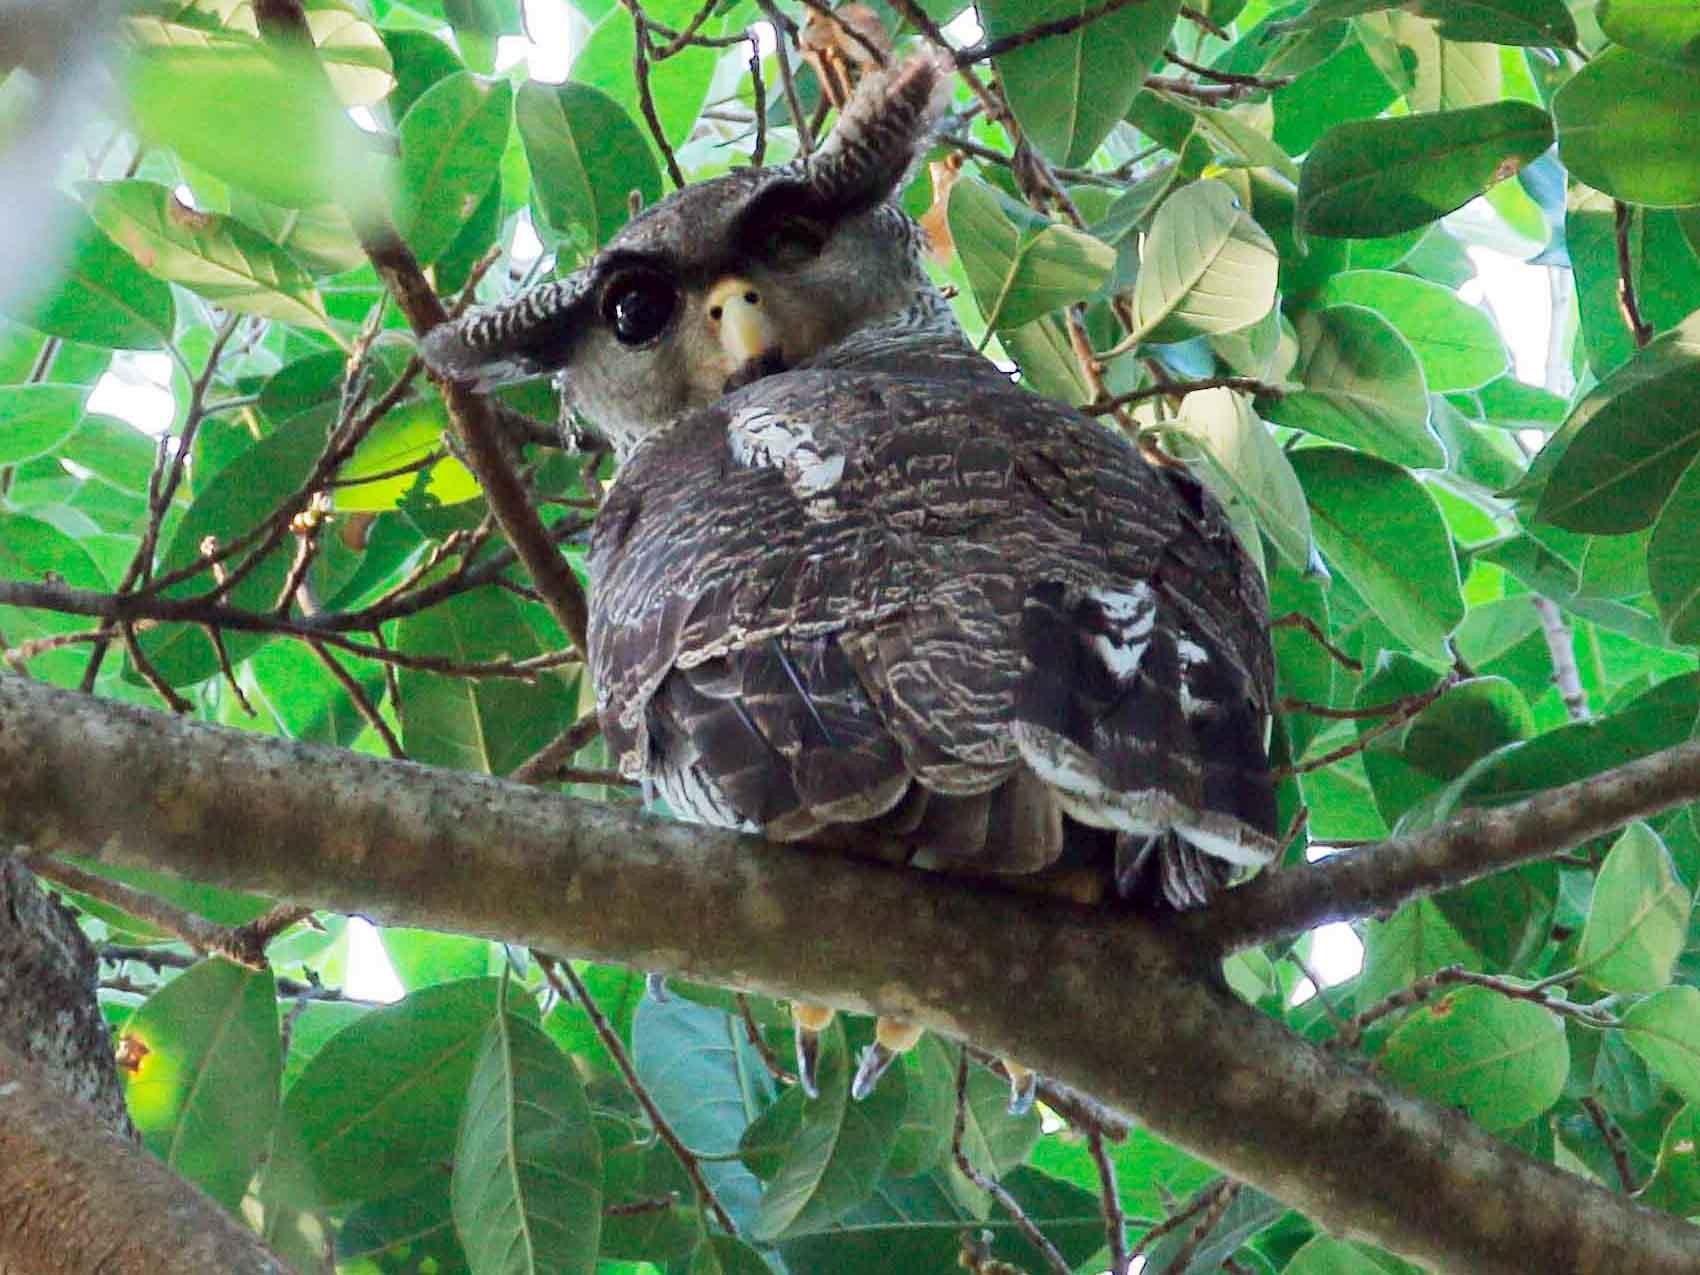 Barred Eagle-Owl - Neoh Hor Kee